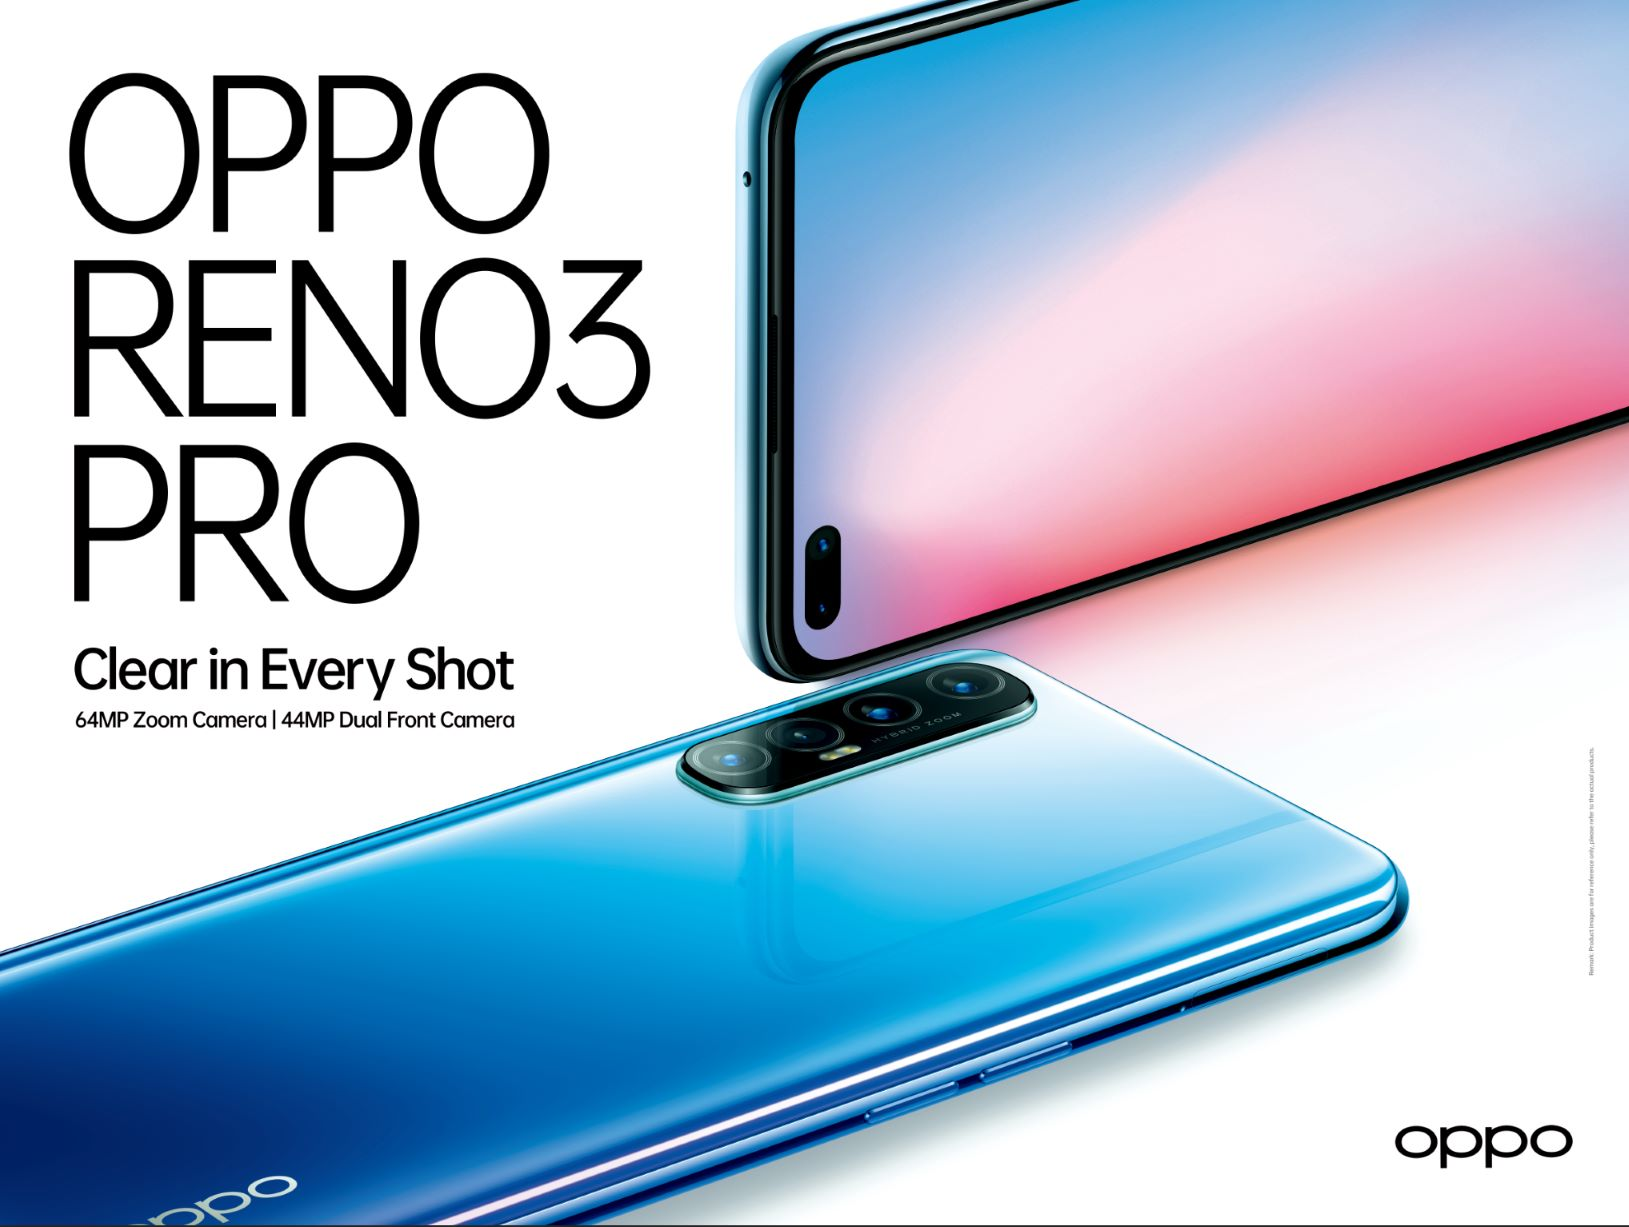 OPPO تطلق سلسلة هواتفها Reno3 بمزايا تصوير احترافية